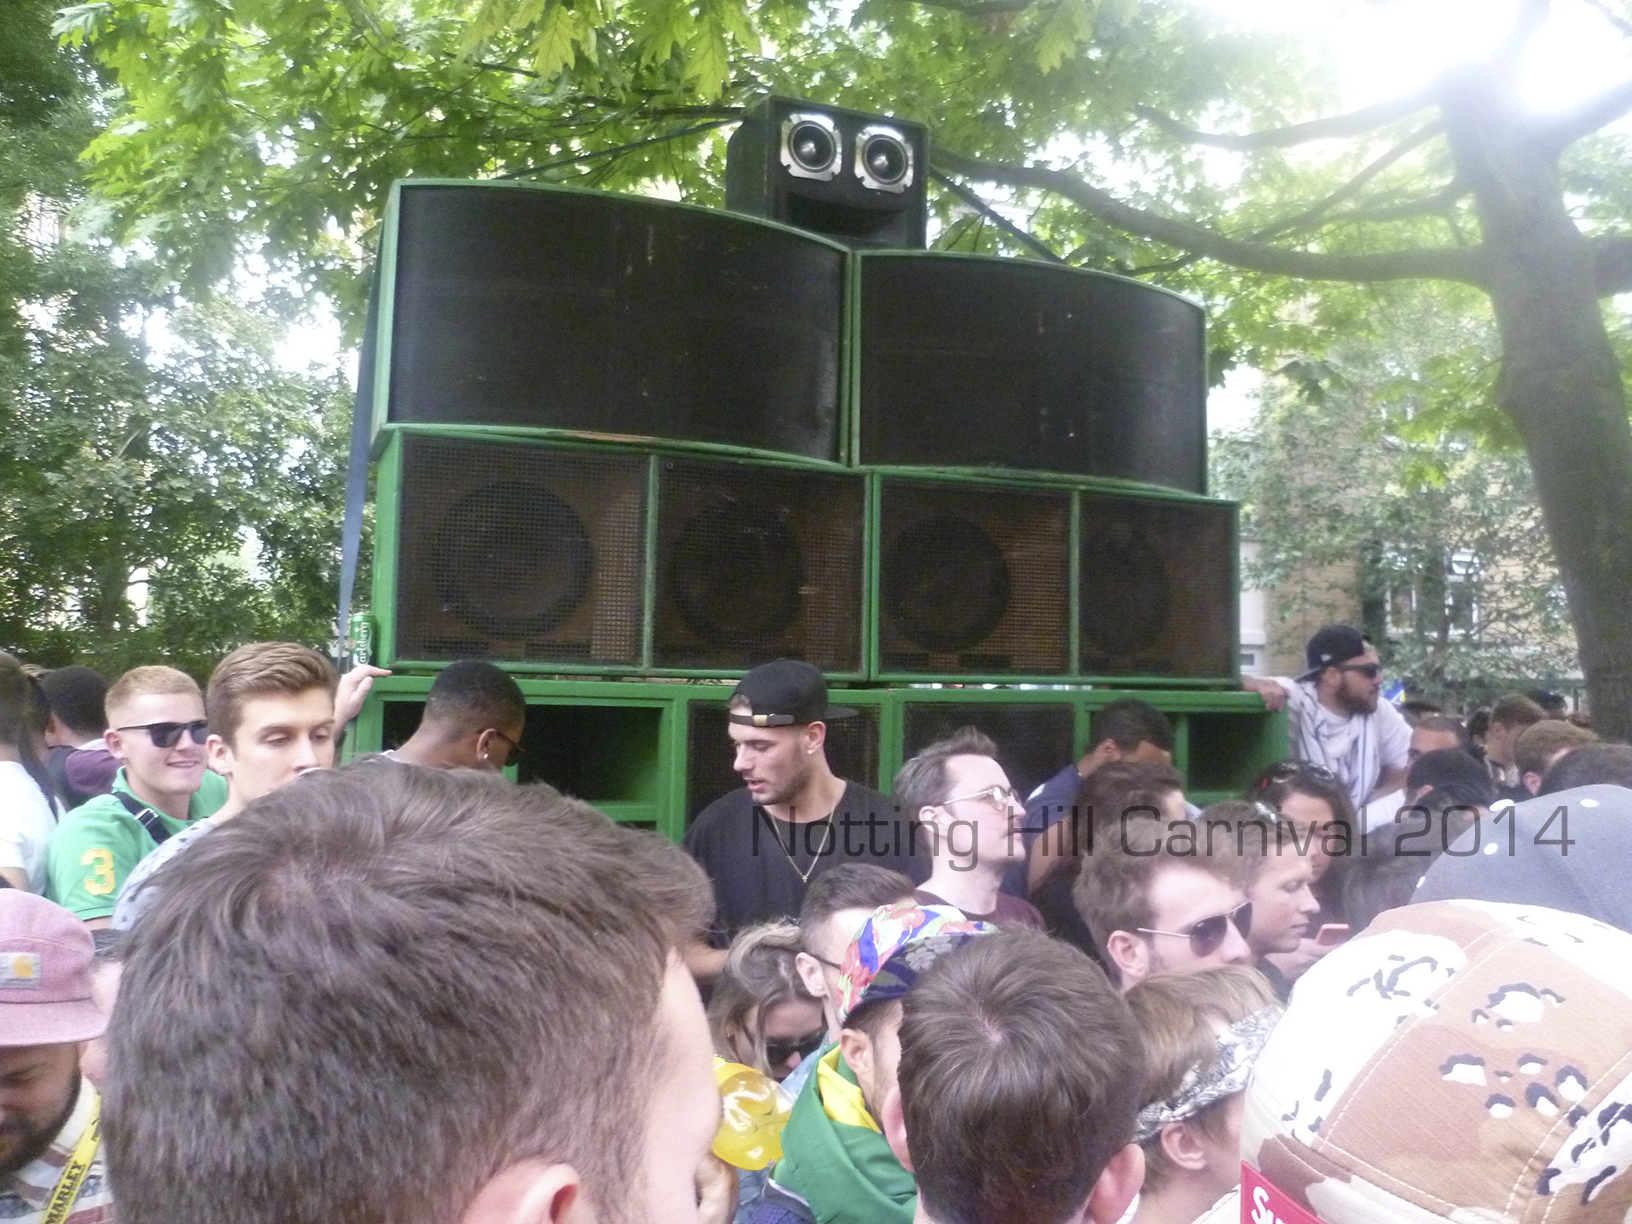 Notting-Hill-Carnival-2014-Street-Sound-System-20